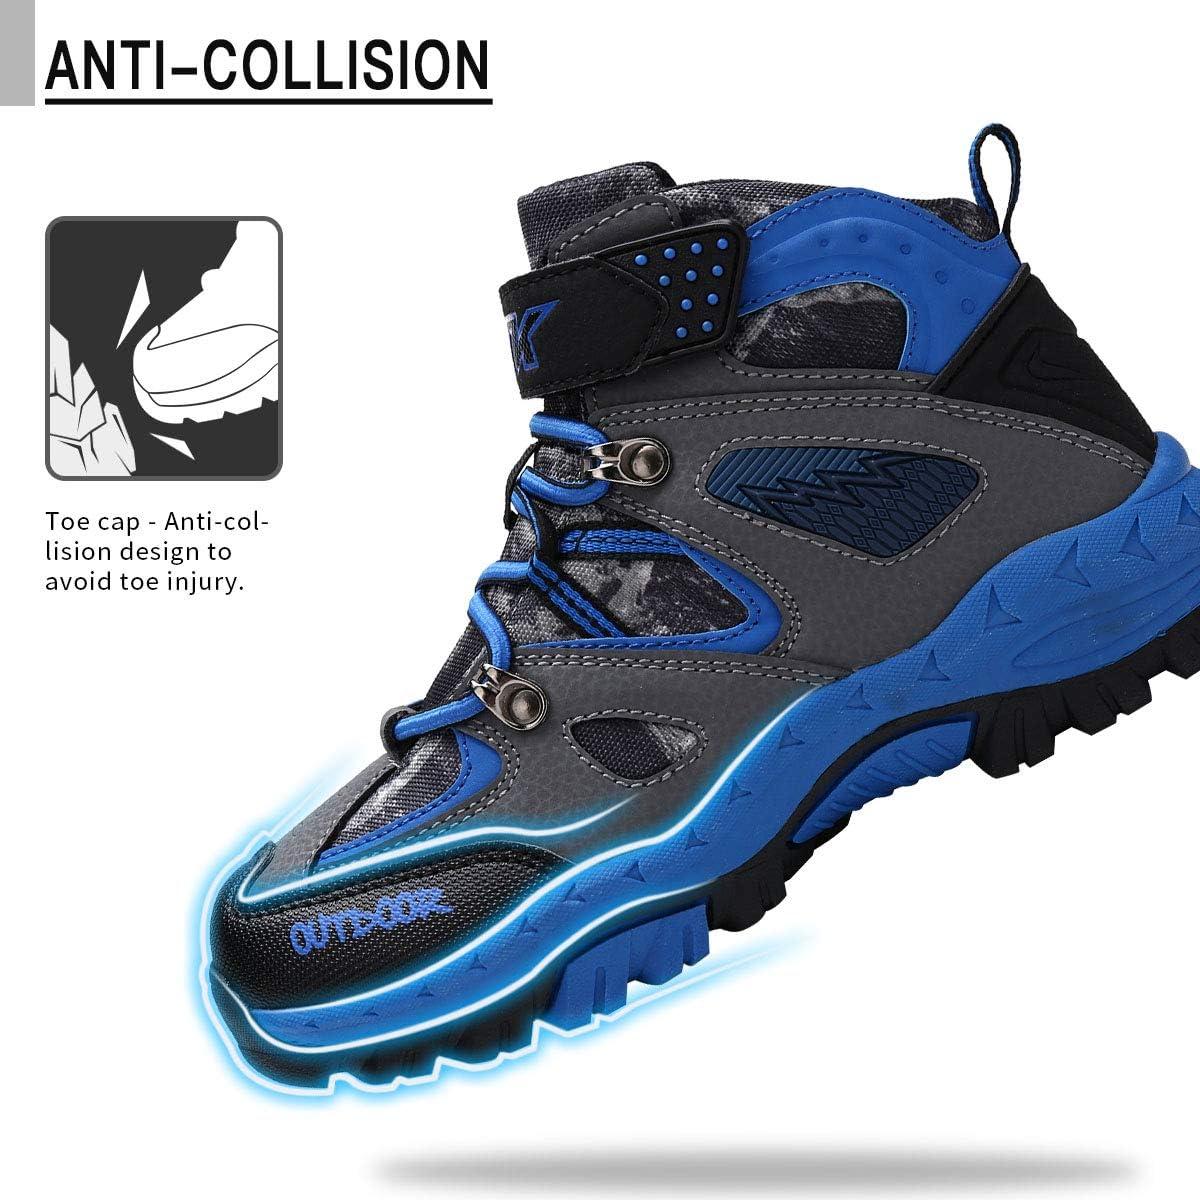 ASHION Chaussures de randonn/ée gar/çon Montantes Fille Trekking Baskets Chaussures de Sport